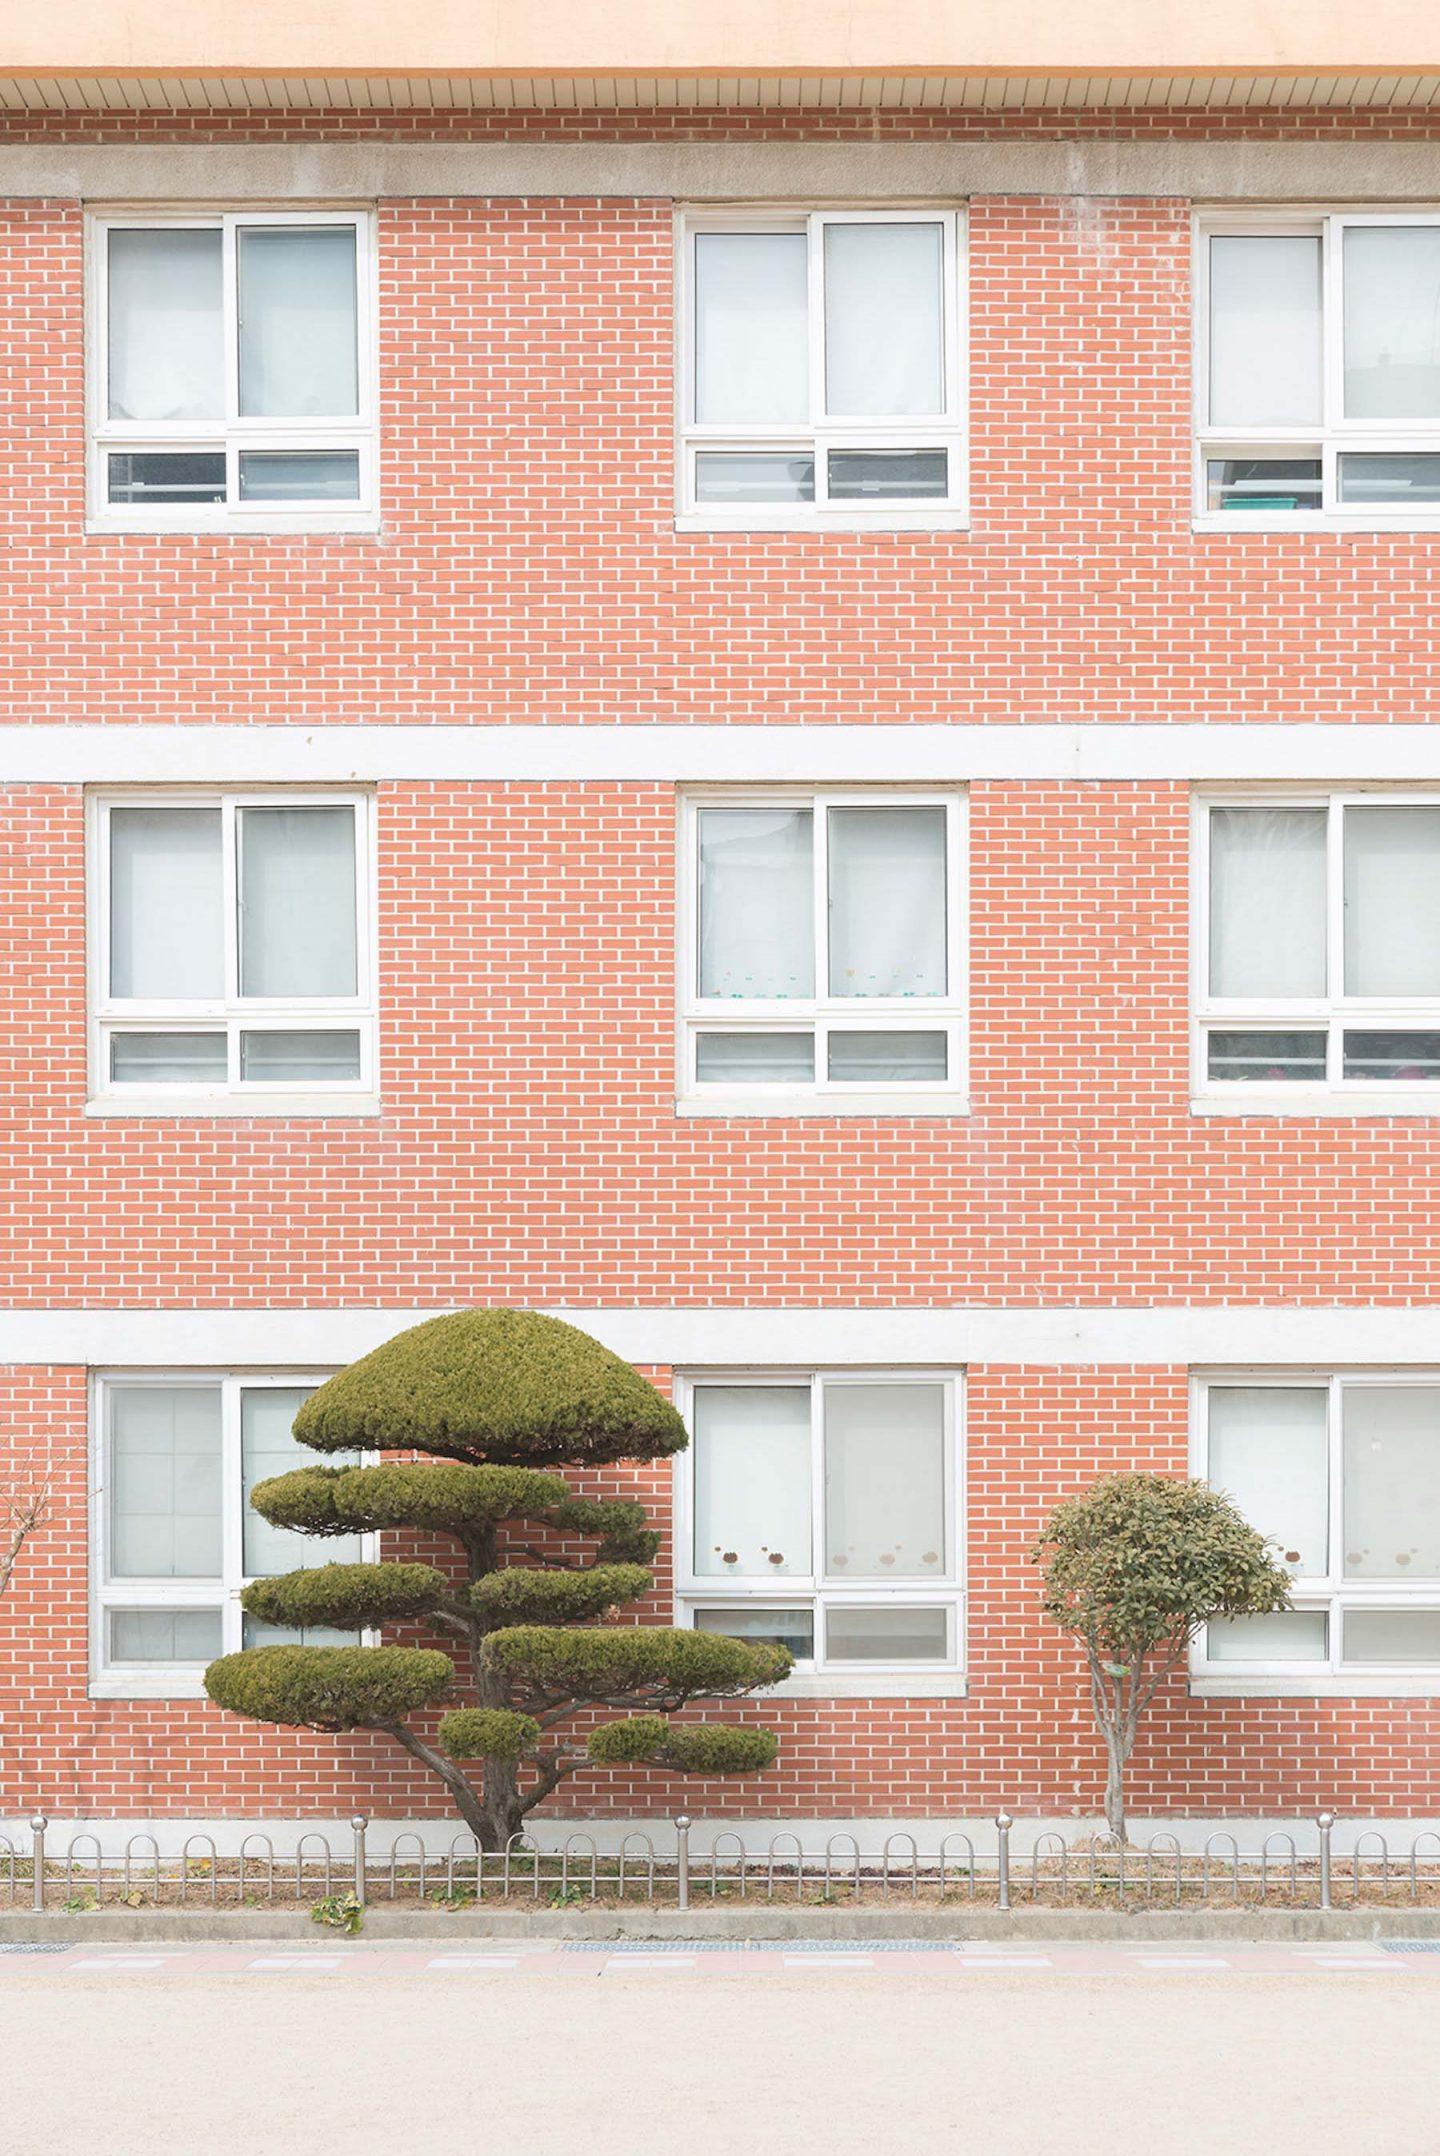 iGNANT-Photography-Andres-Gallardo-Korean-Schooling-08